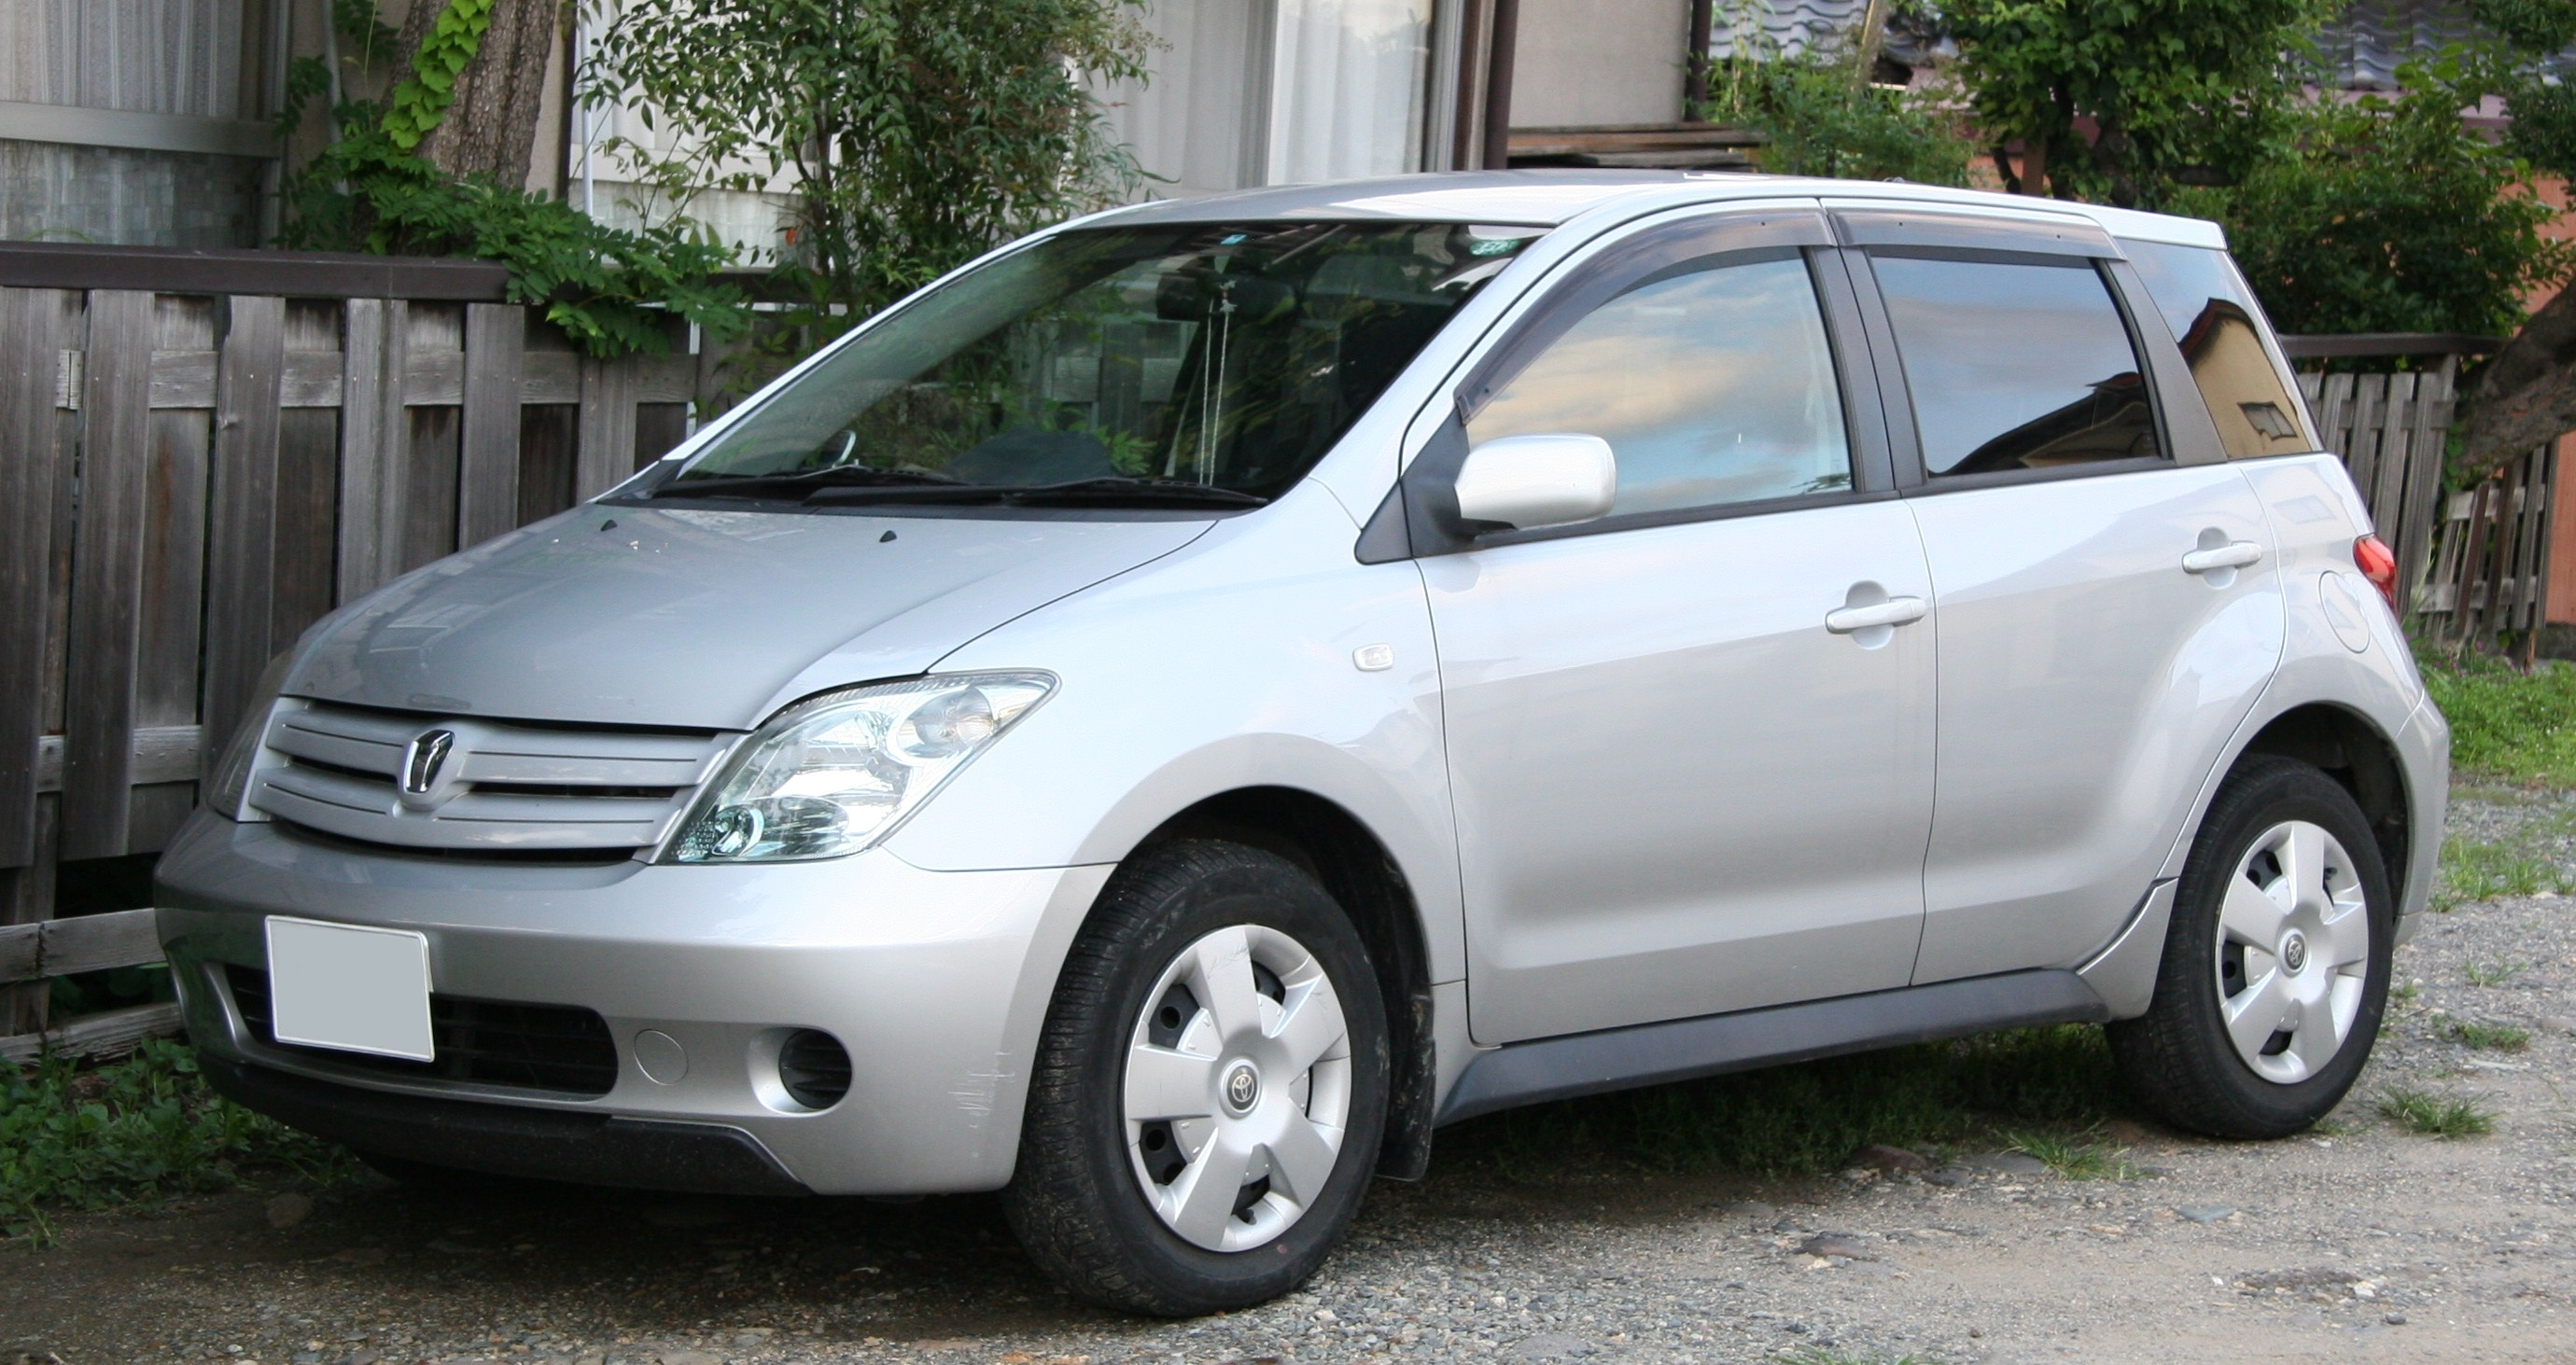 New Car Toyota Camry Price